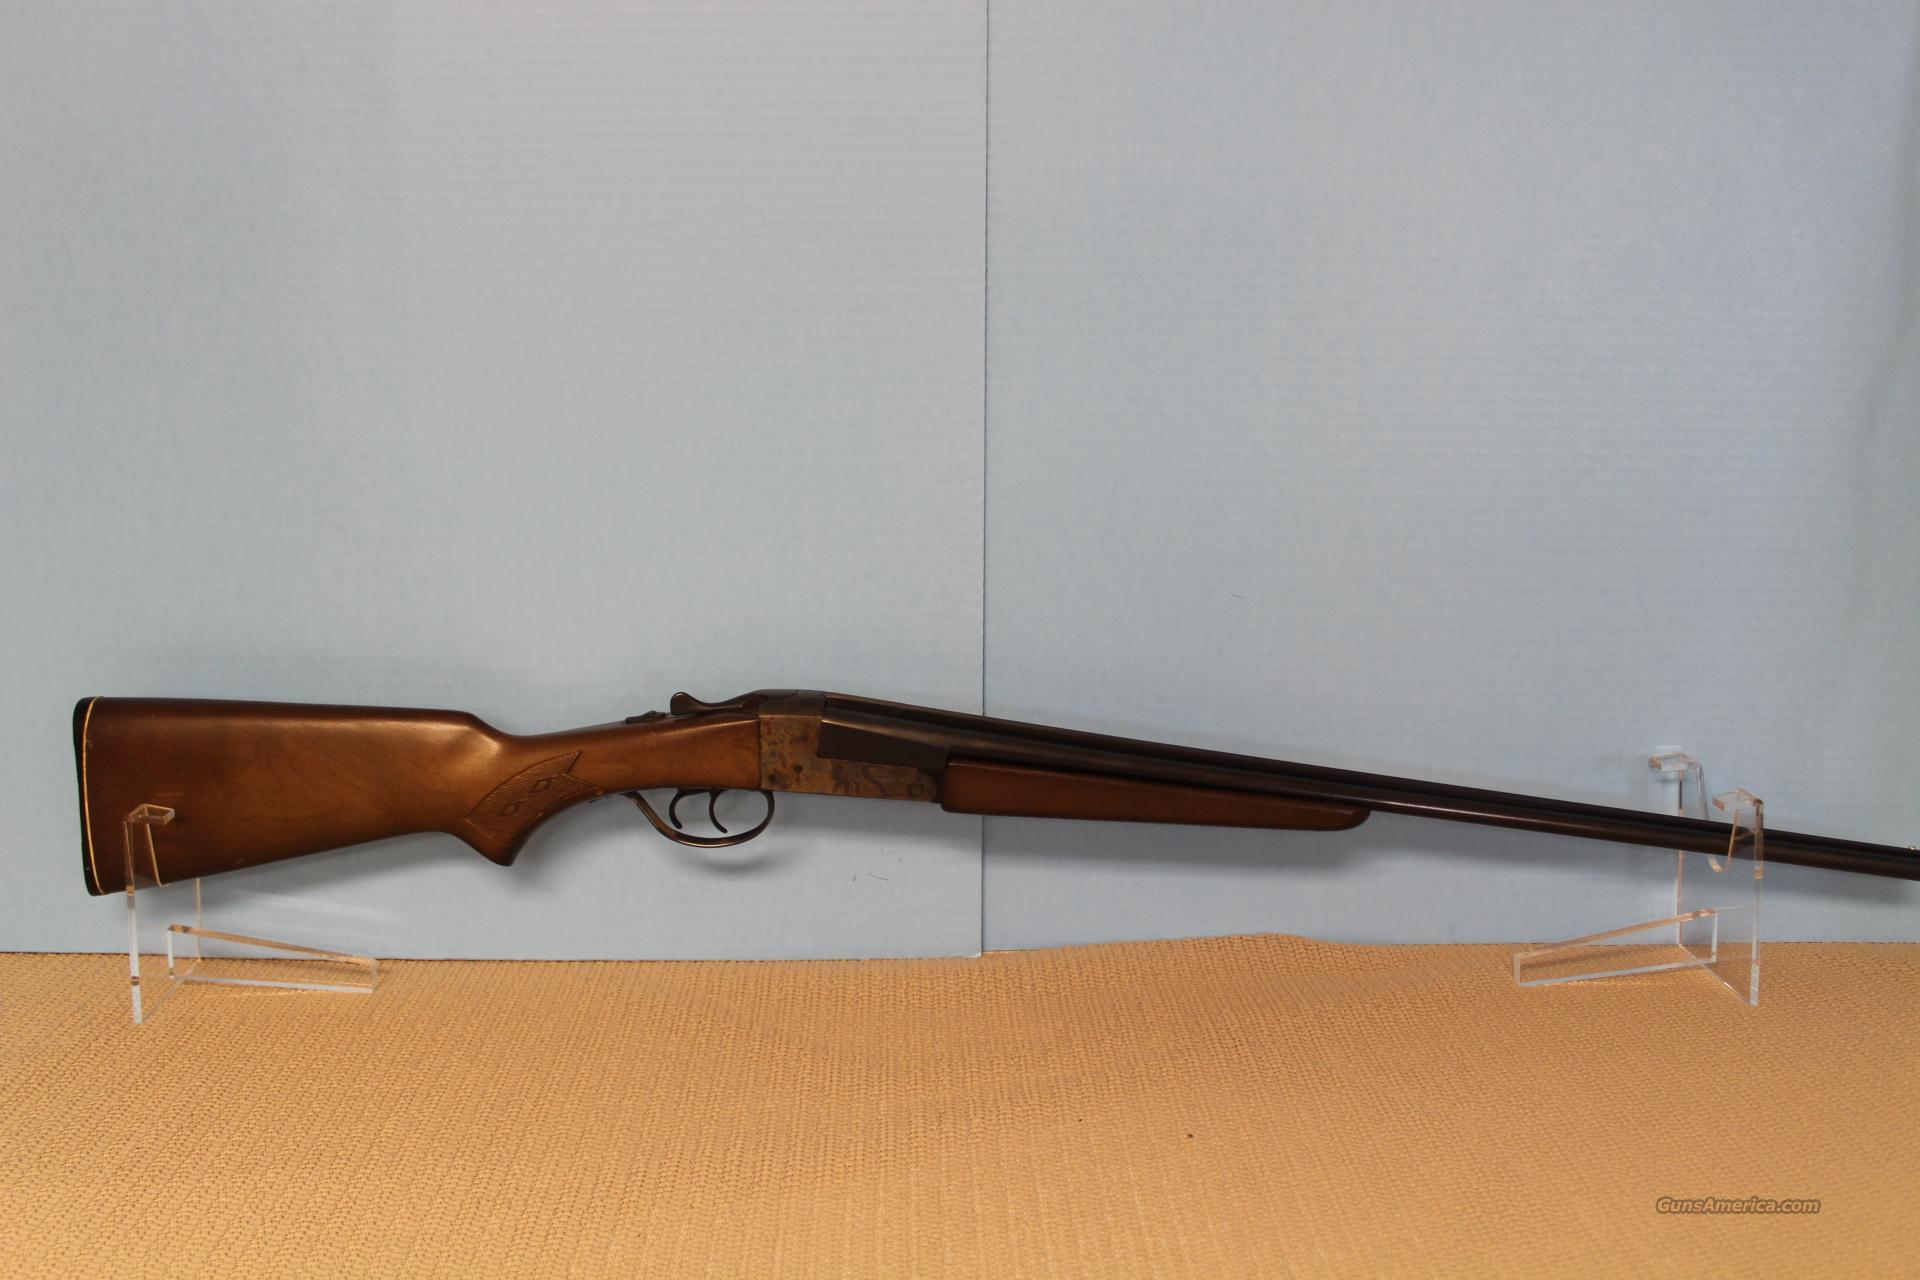 Stevens 311 .410 Double-Barrel Shotgun for sale